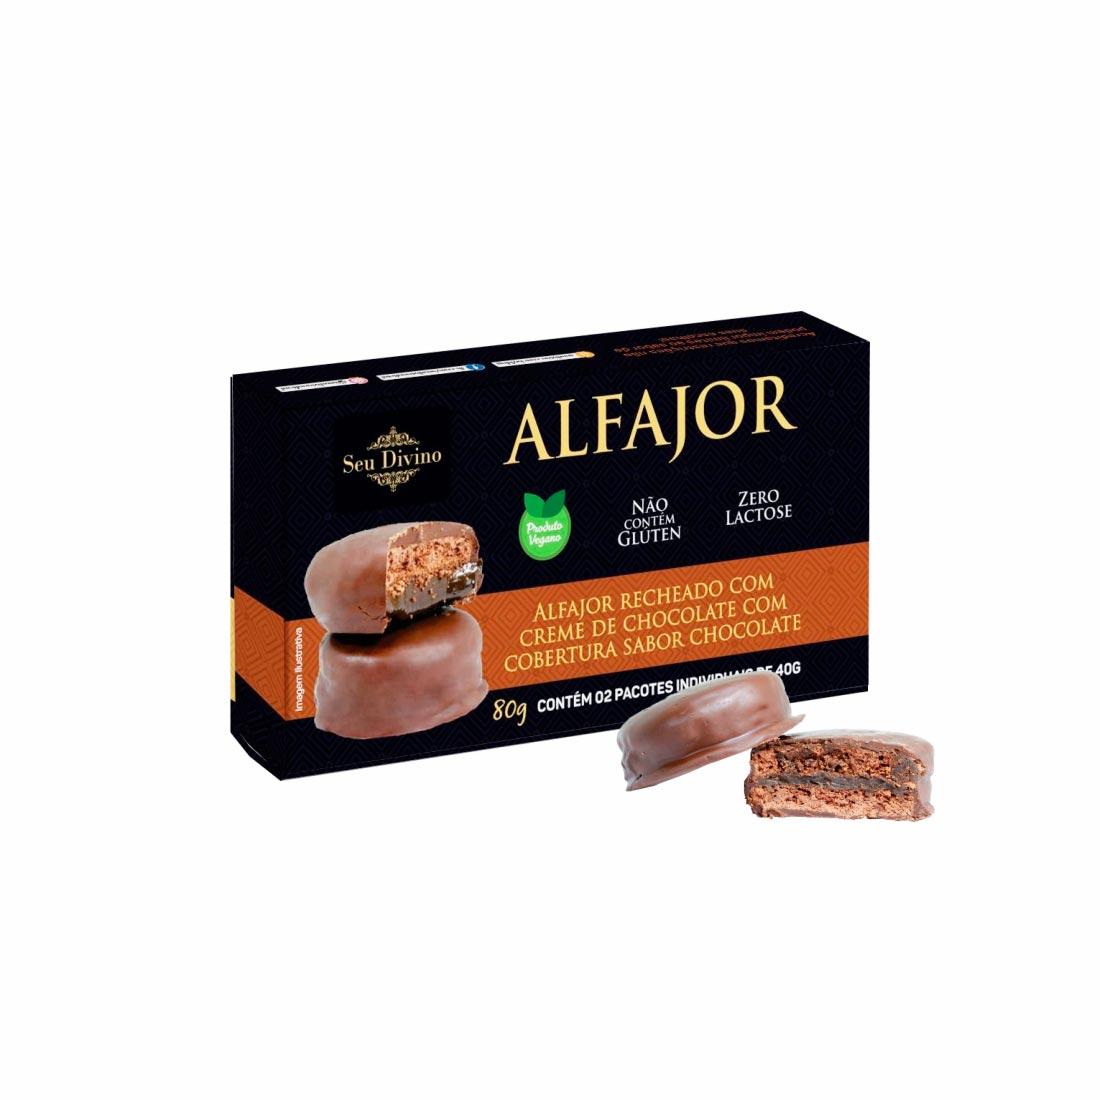 ALFAJOR NEGRO CHOCOLATE SEU DIVINO S/GLÚTEN 0%LACTOSE VEGANO 80G